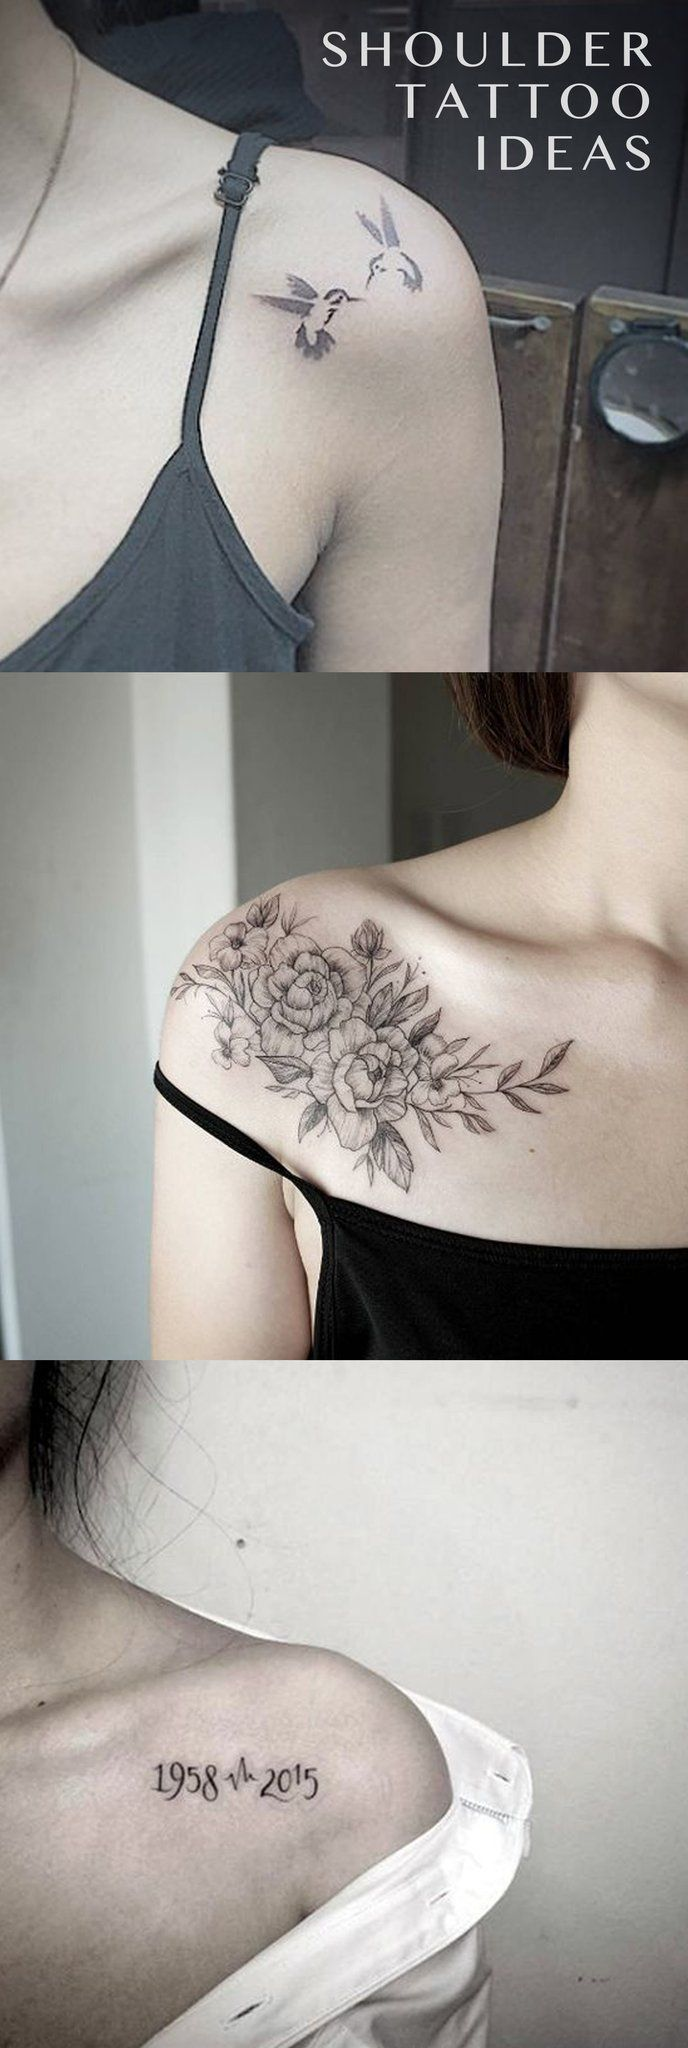 Small Delicate Shoulder Blade Tattoo Ideas for Women - Floral Flower Ideas Del Tatuaje - Sparrow Tatouage - Marriage Birthdate Idéias de tatuagem - www.MyBodiArt.com #tattoosformarriage #smalltattoos